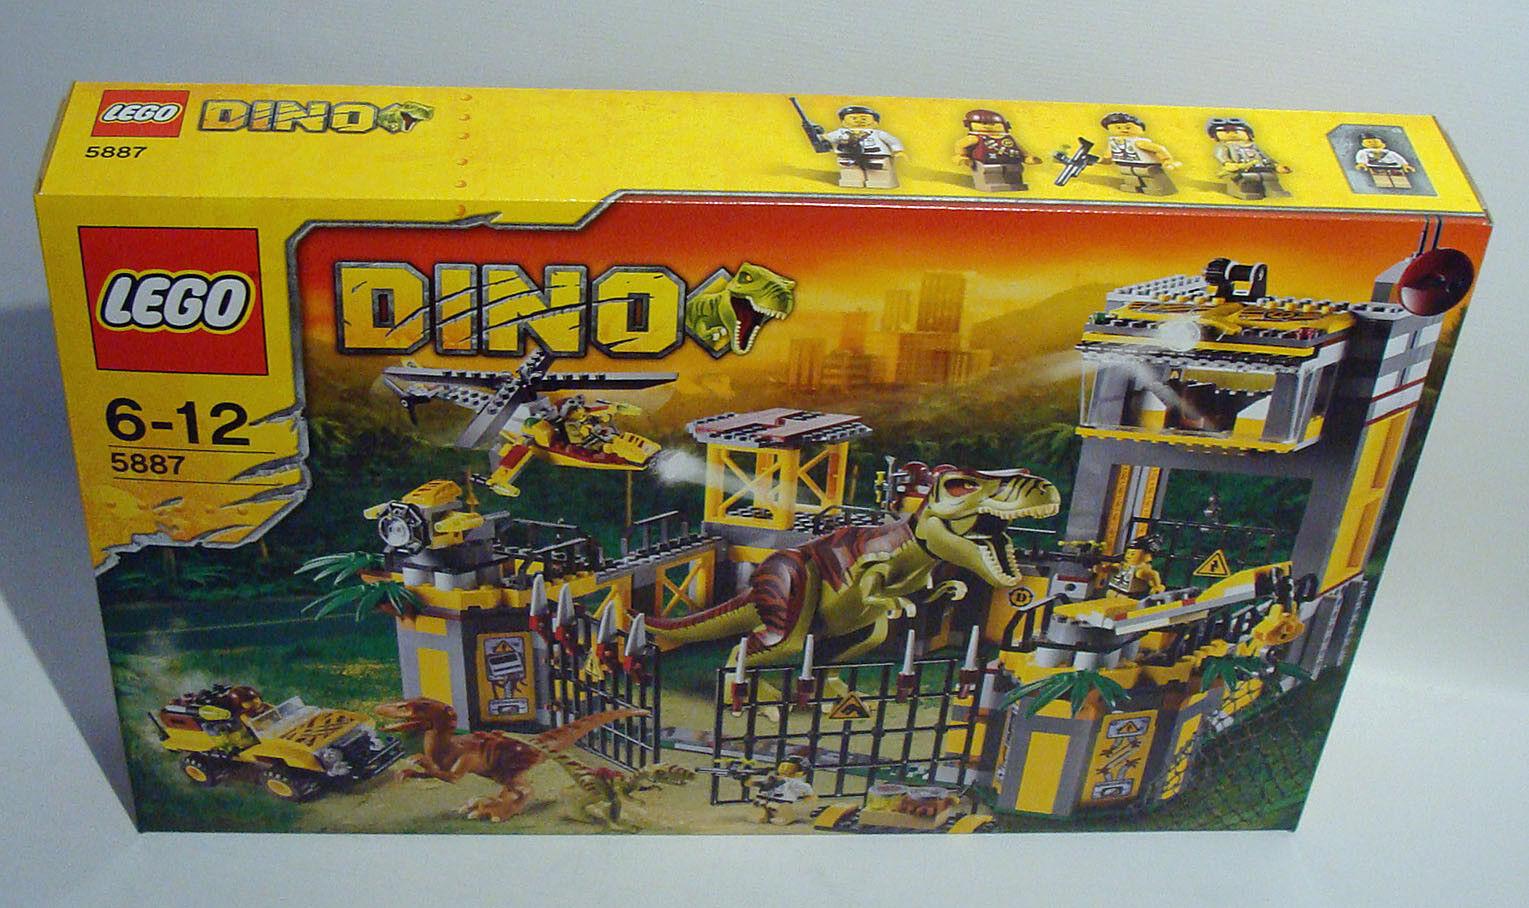 Lego® Dino 5887 - Dinosaurier Forschungsstation 793 Teile 6-12 Jahren - Neu